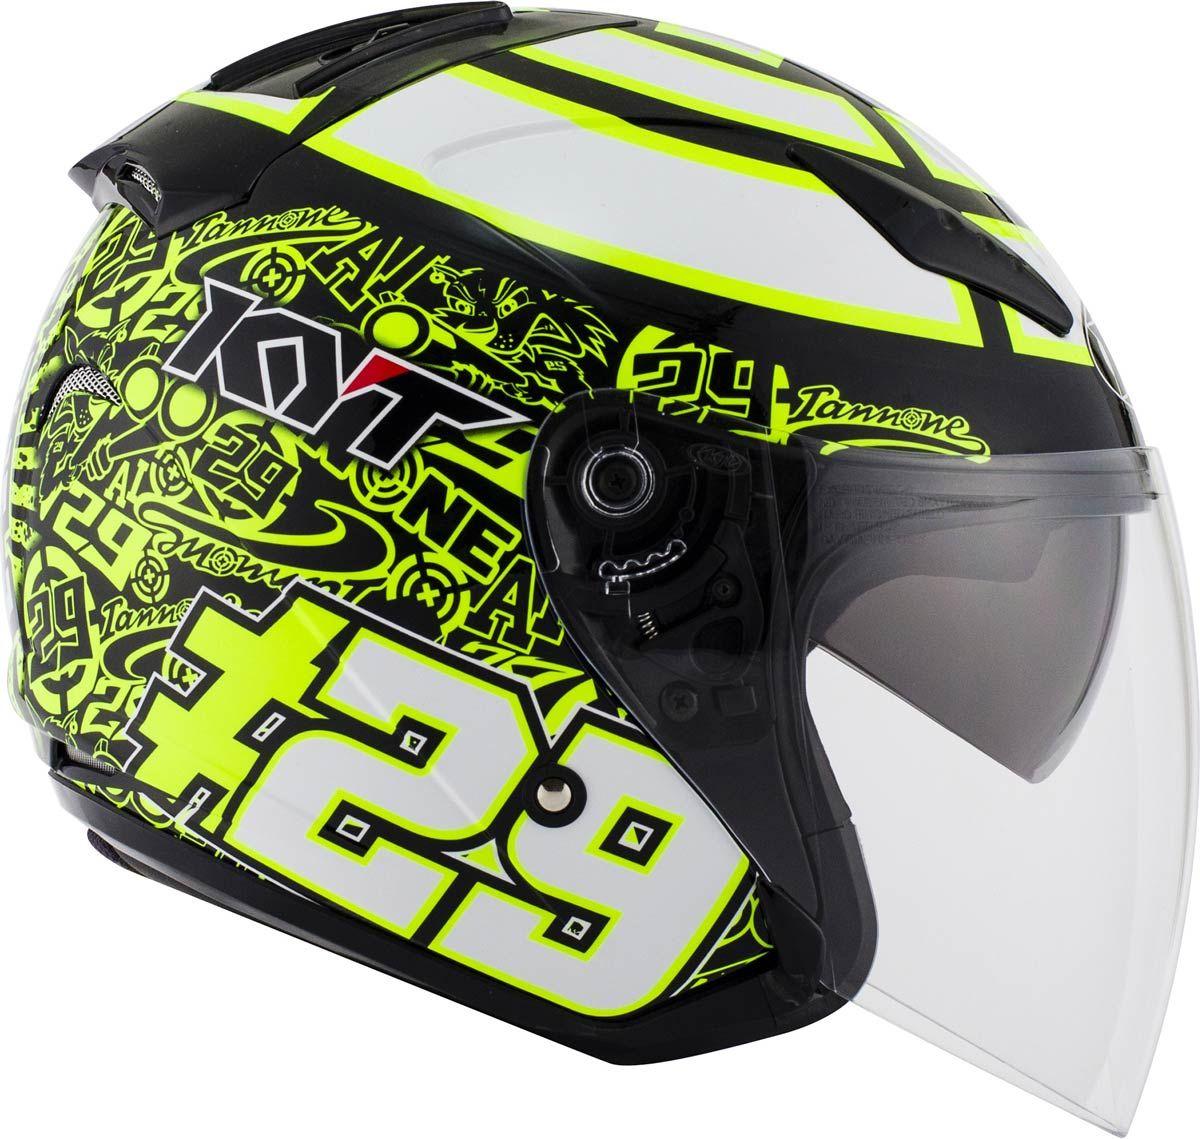 0229eedc41ab53 Pour 2016, KYT Helmets lance ce casque jet HellCat Iannone Replica